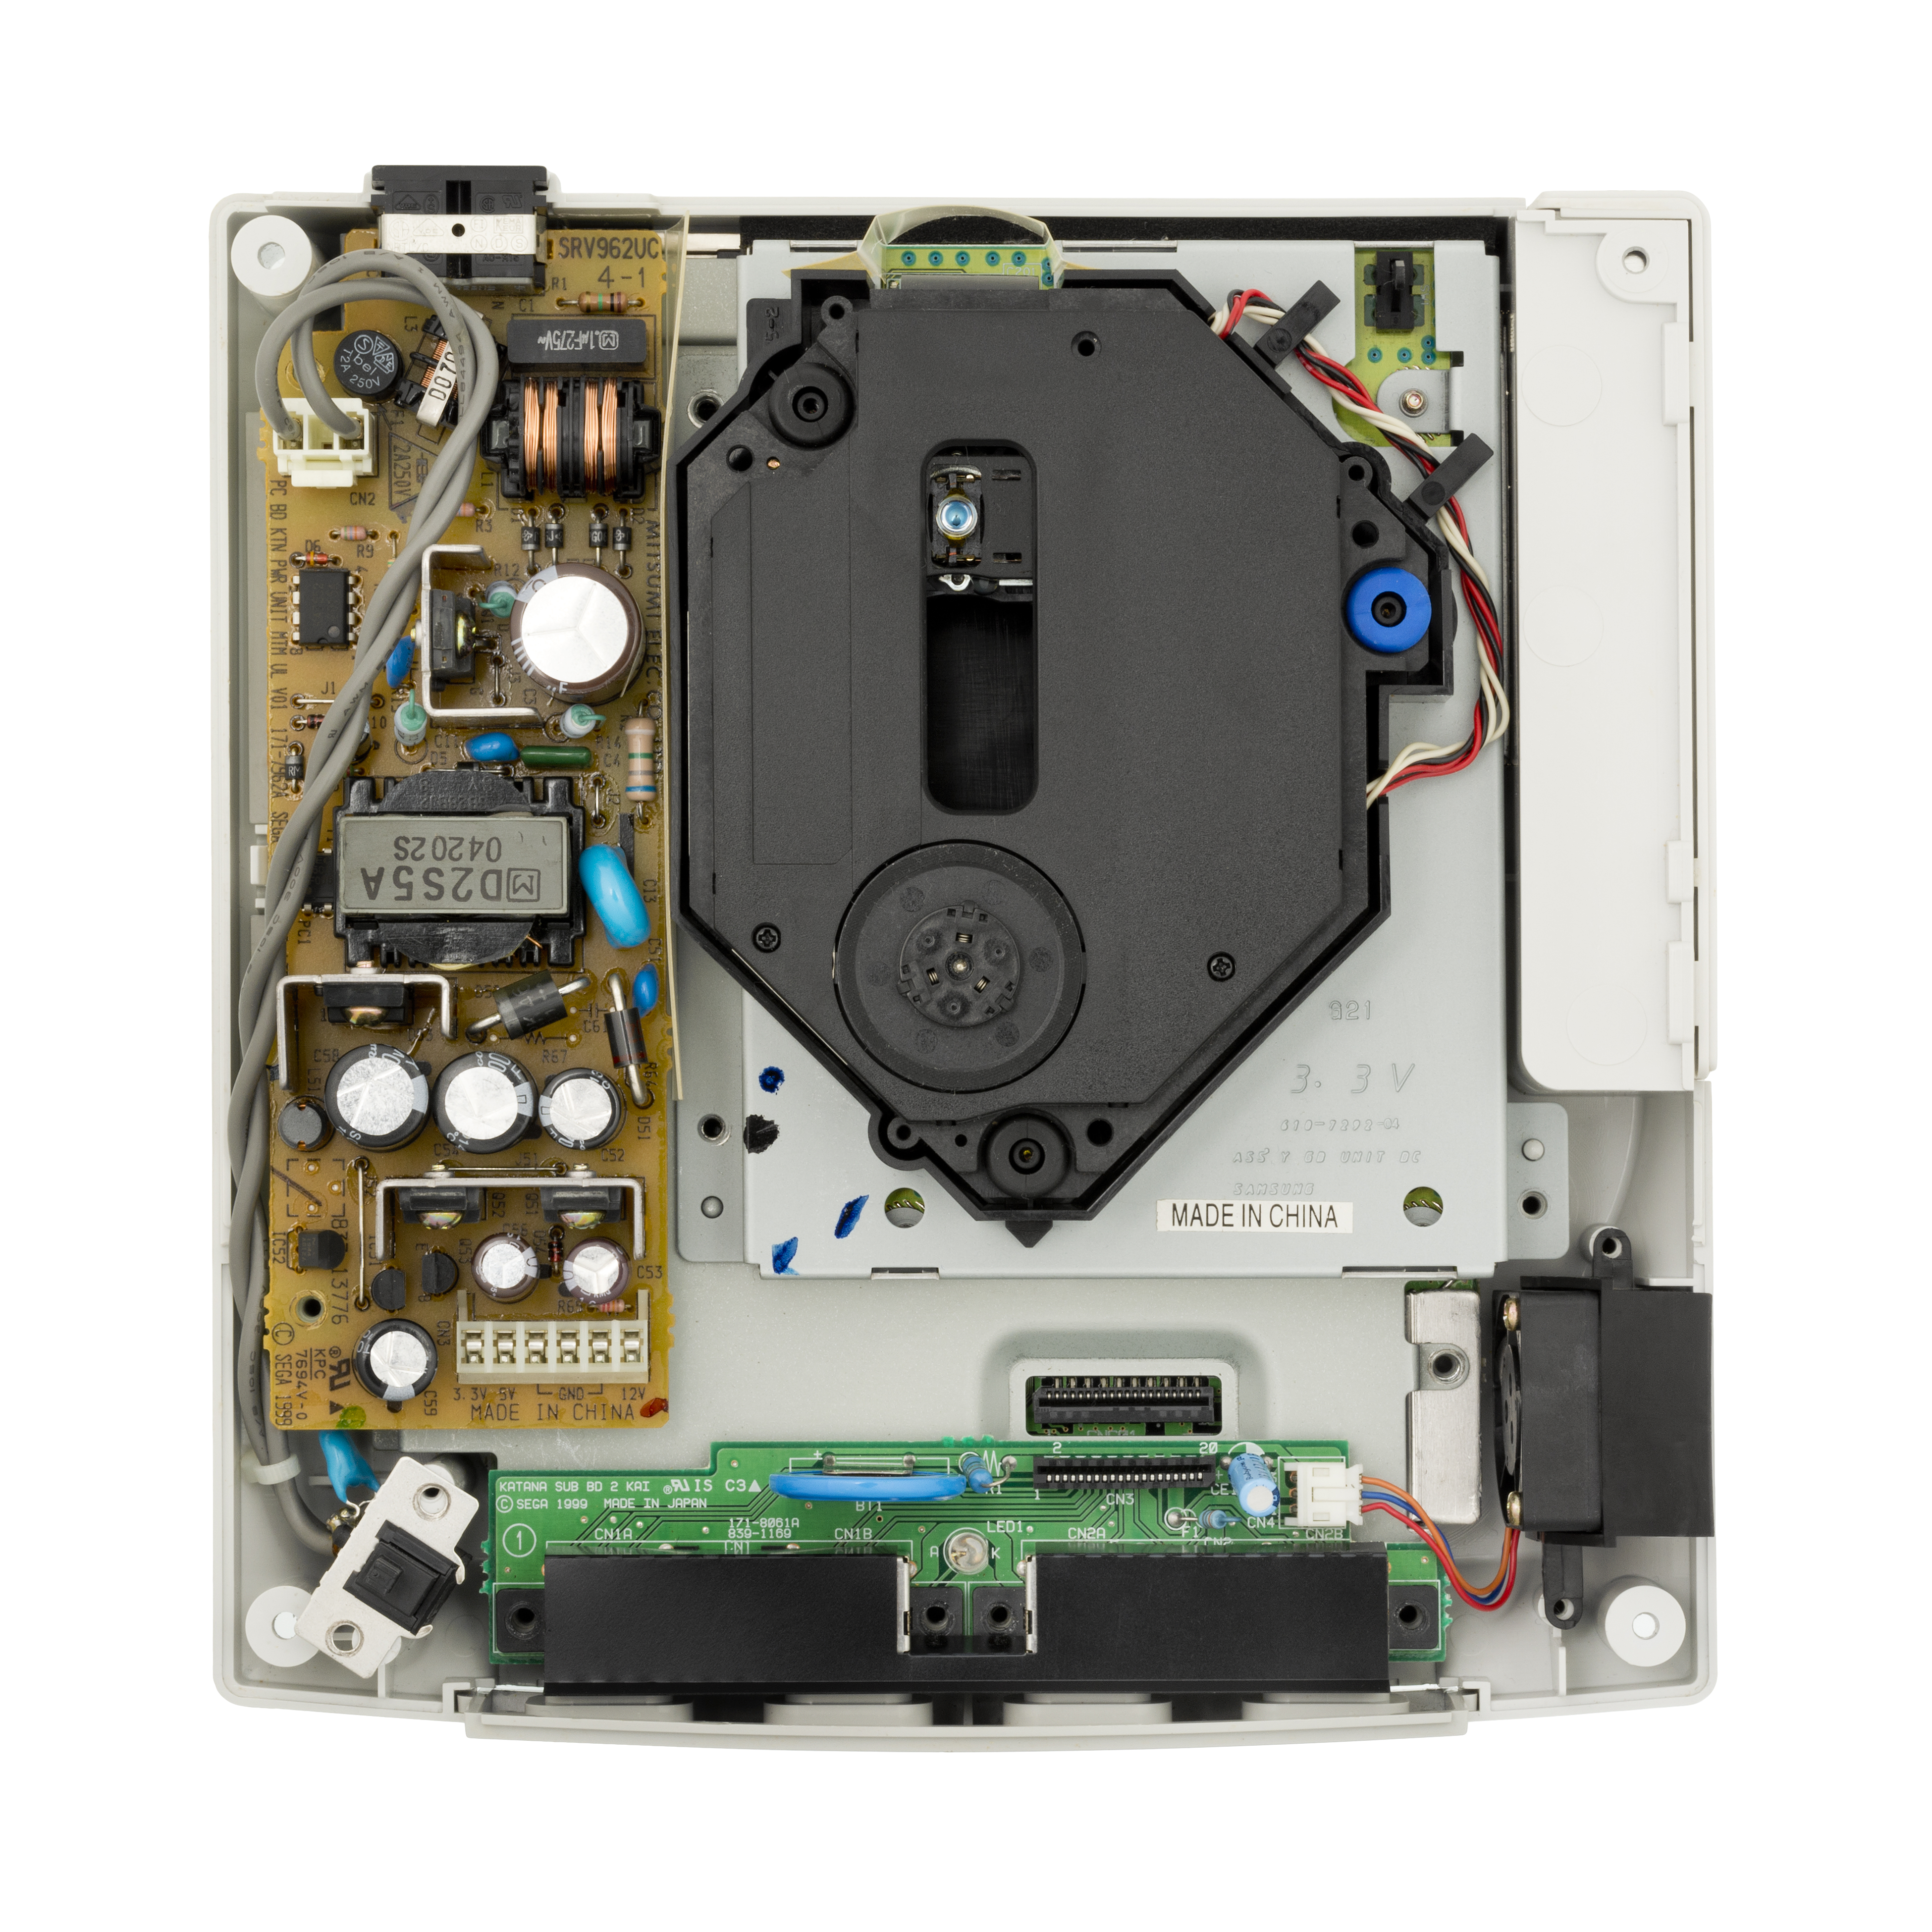 File:Sega-Dreamcast-Internals jpg - Wikimedia Commons